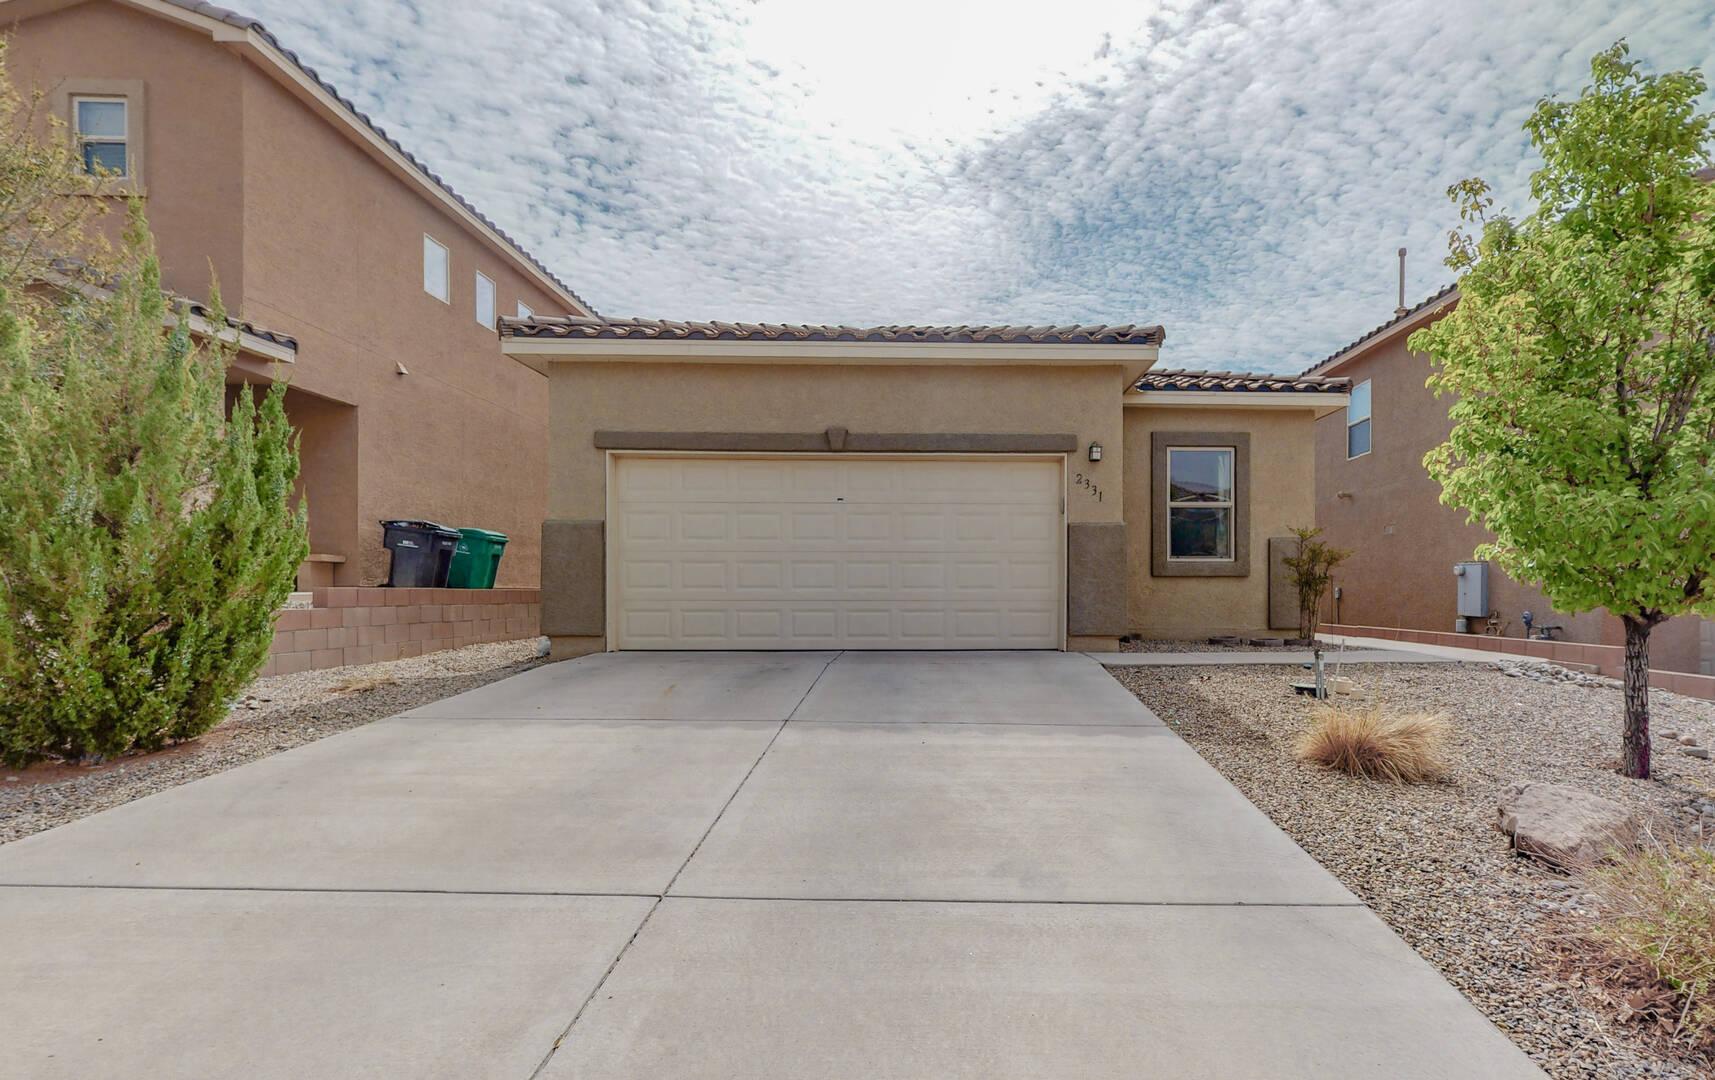 2331 Vista De Colinas Drive Southeast Rio Rancho, NM 87124